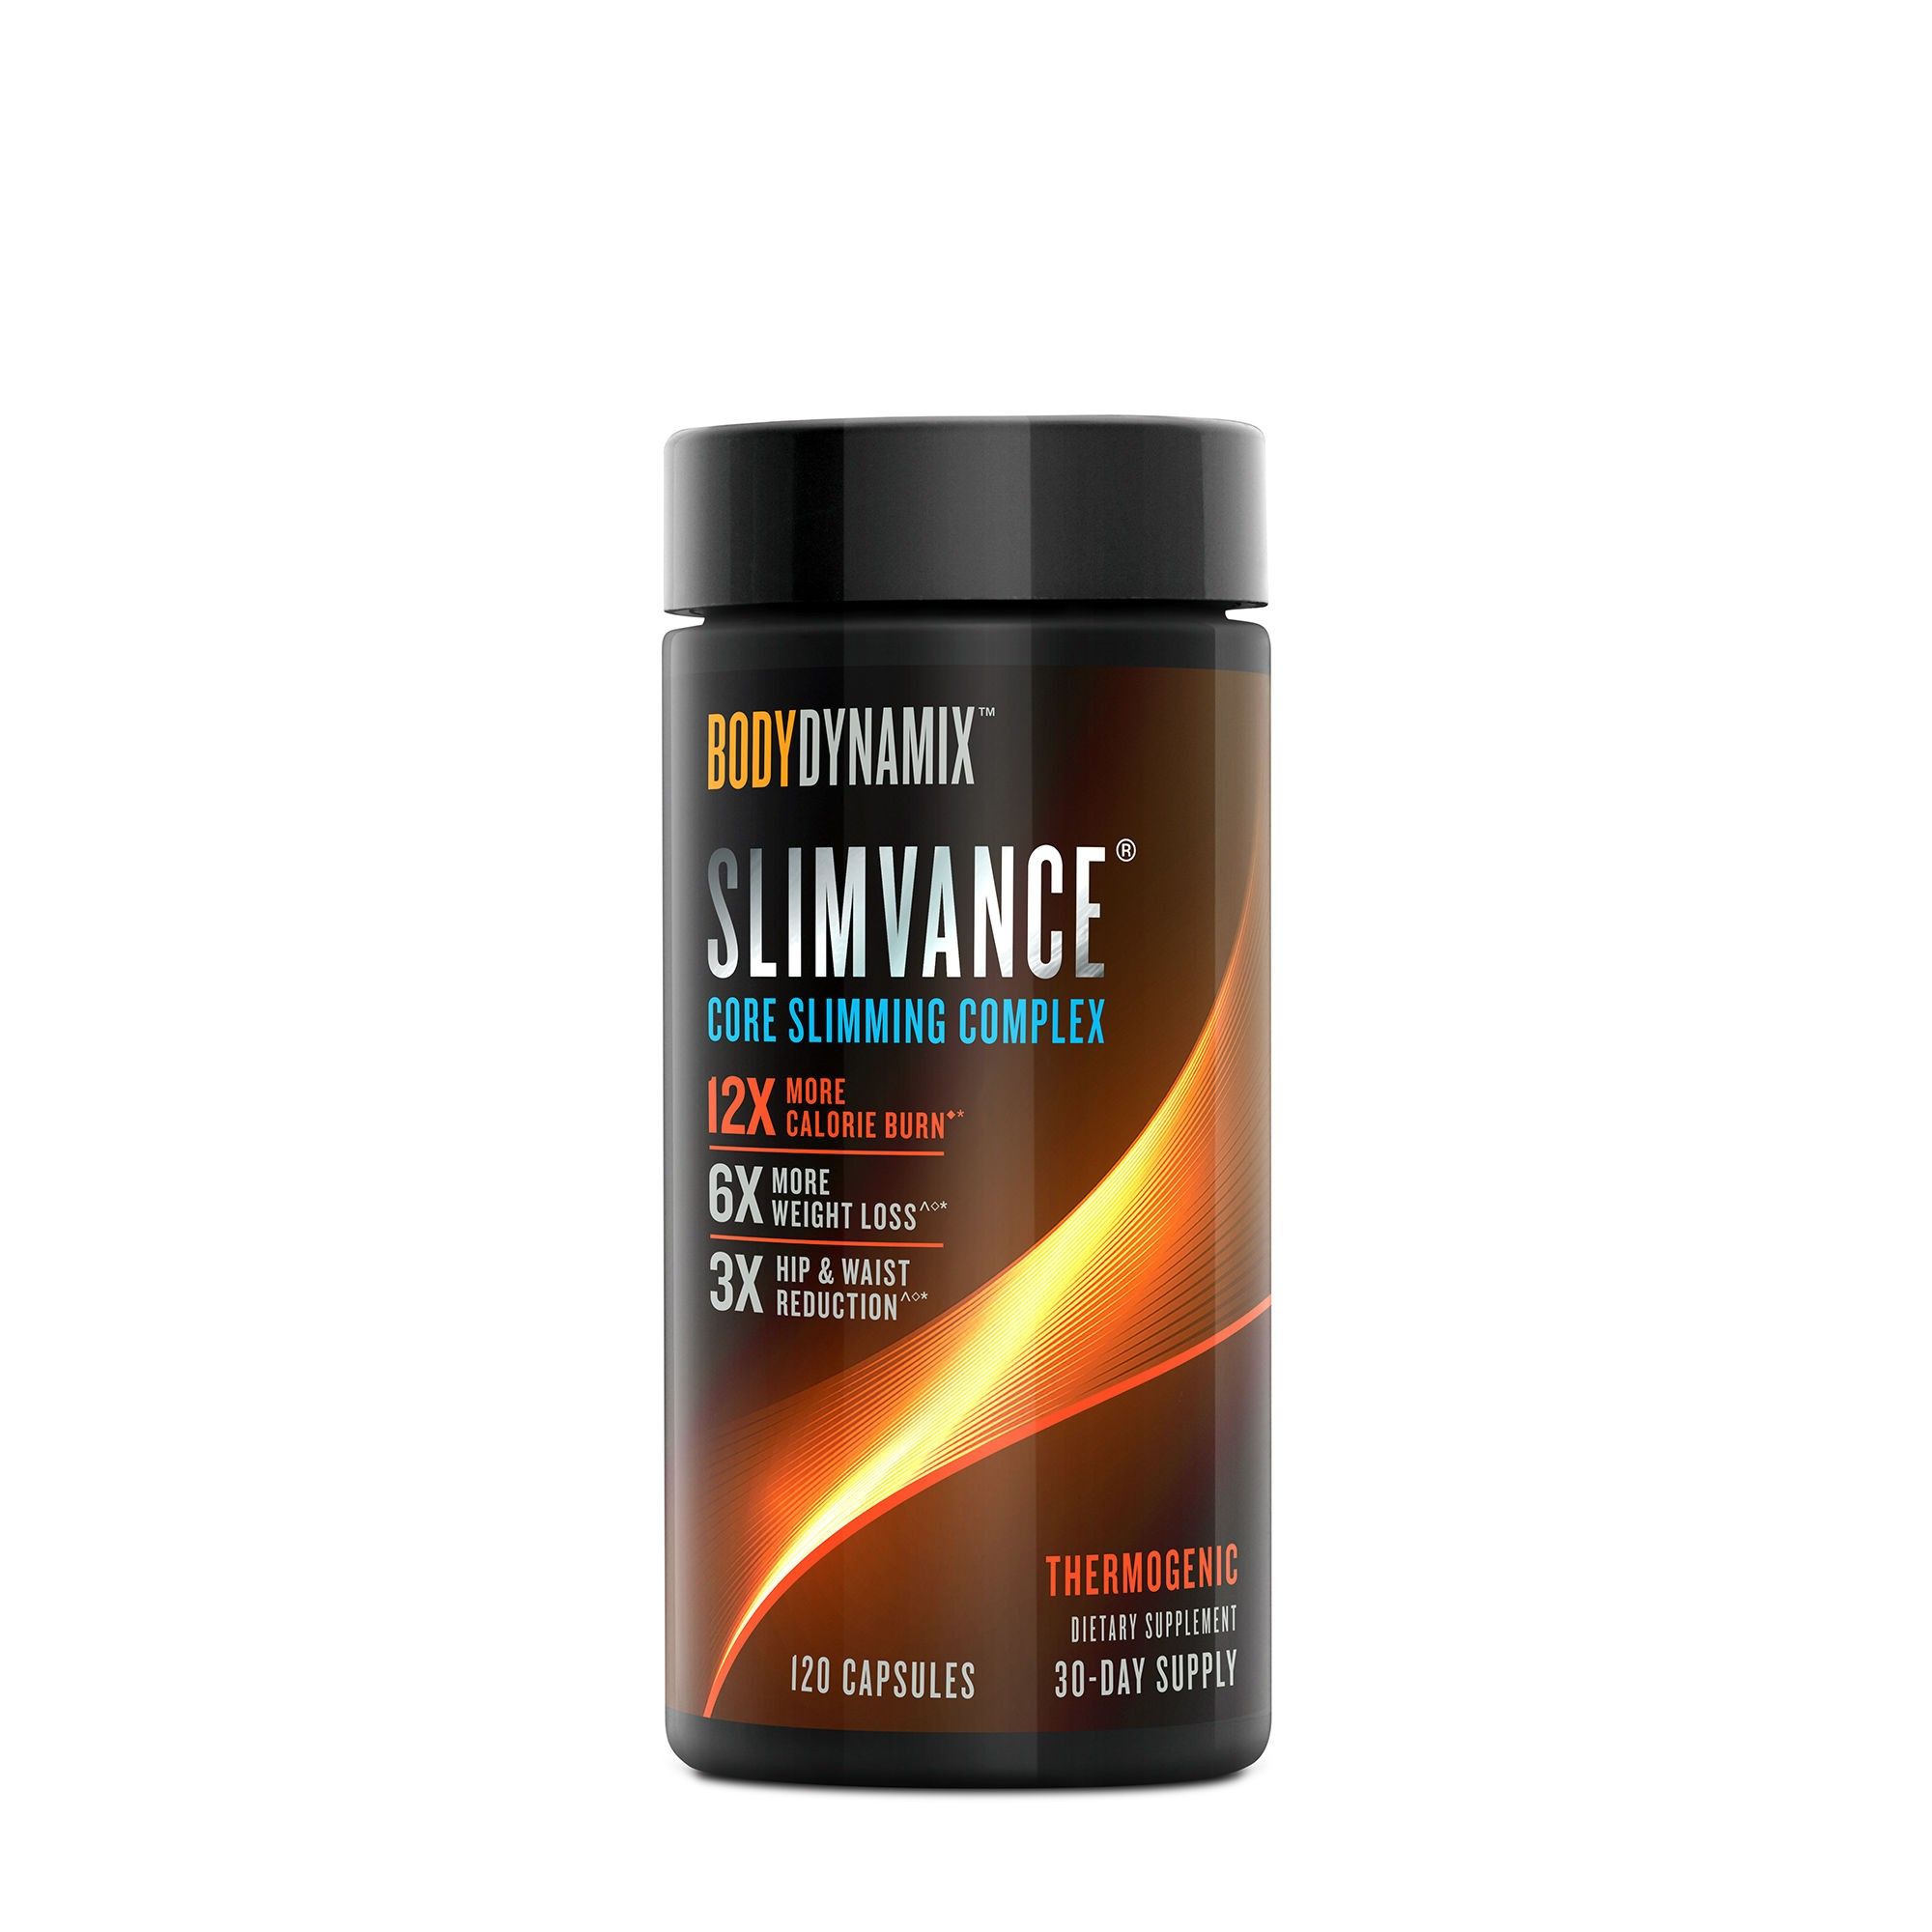 BodyDynamix™ Slimvance® Core Slimming Complex, Formula Pentru Controlul Greutatii, 120 cps